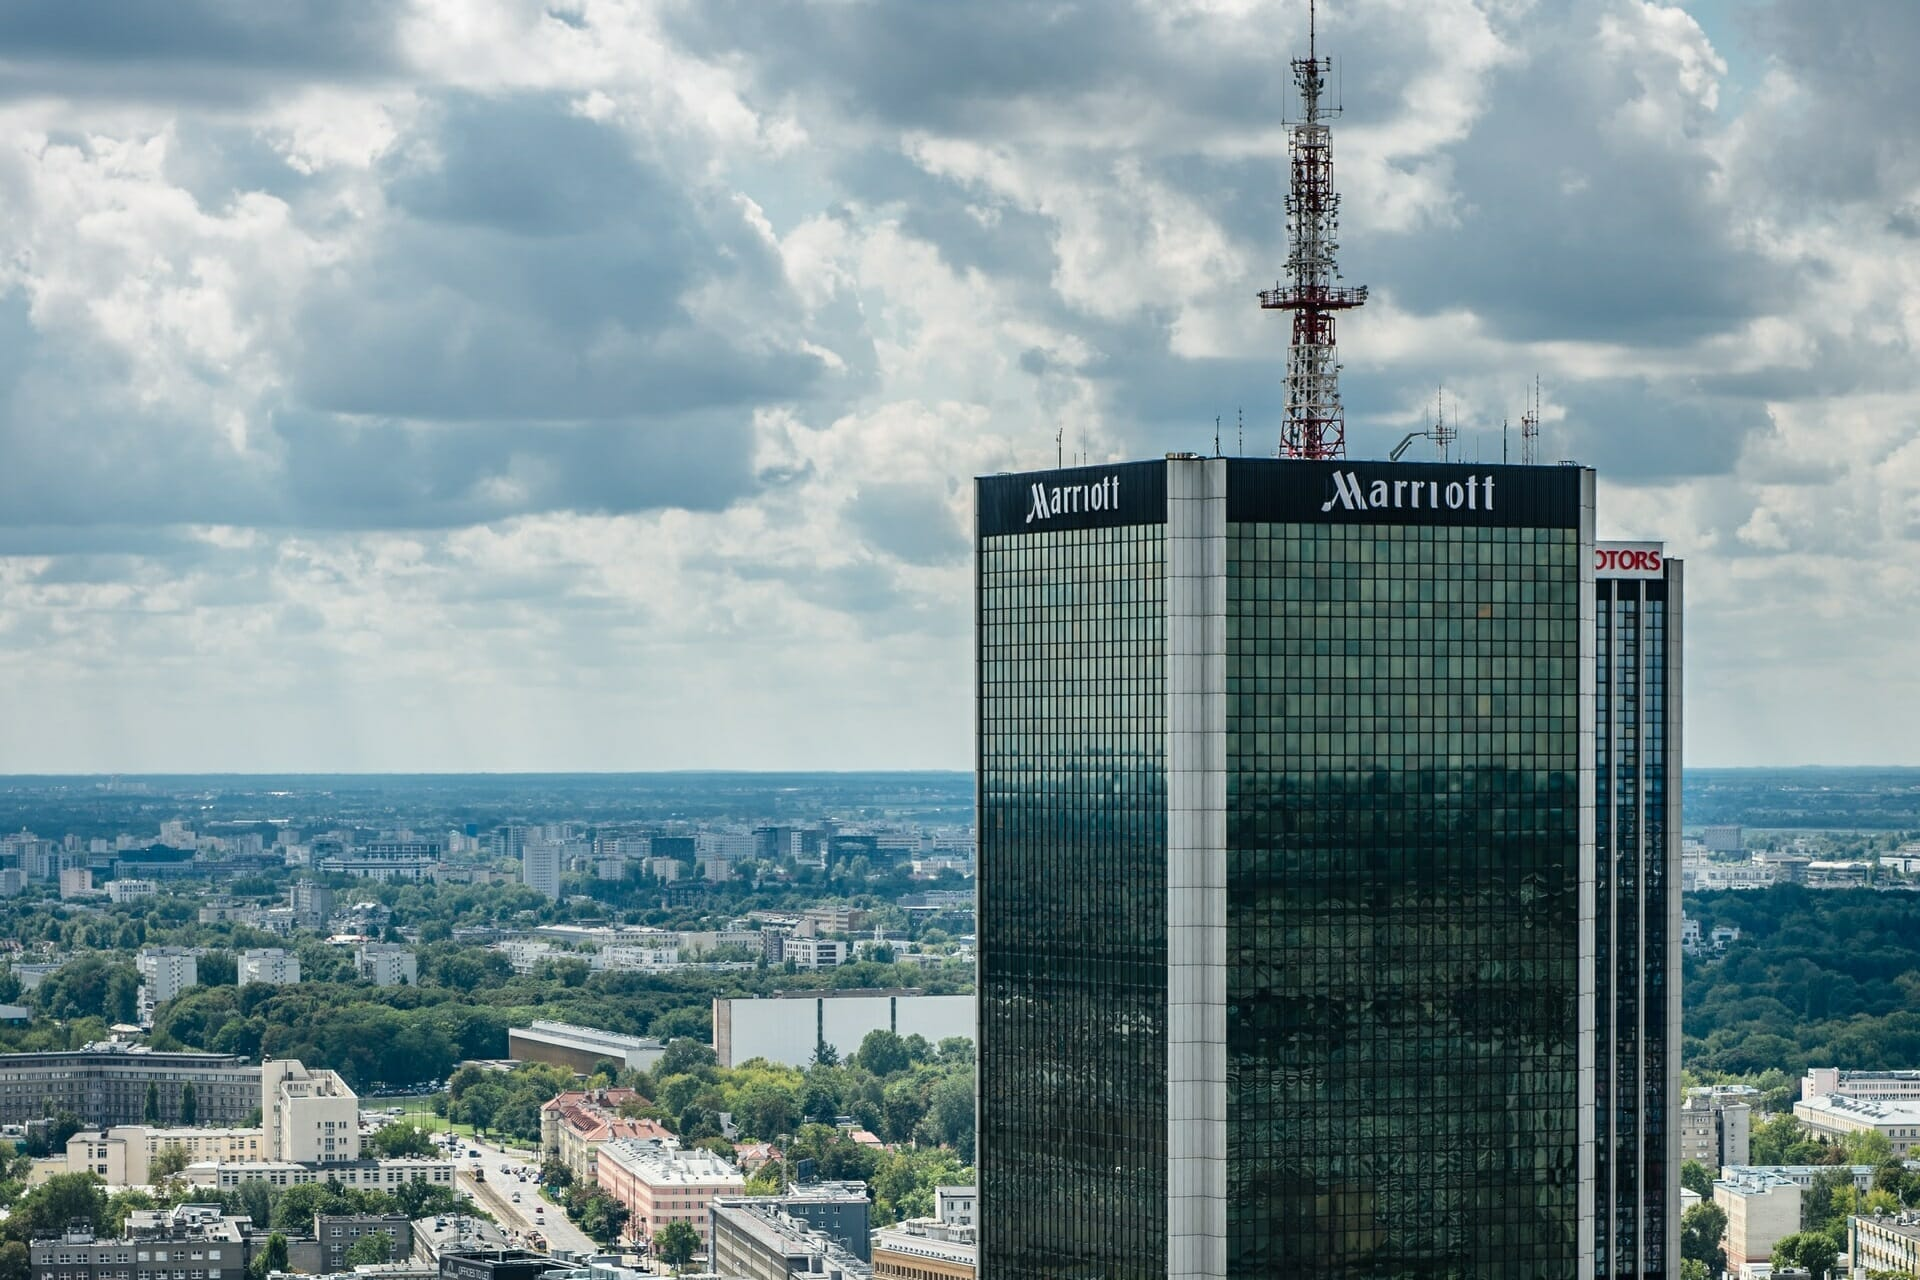 Another marriott data breach exposes 5.2 million bonvoy members